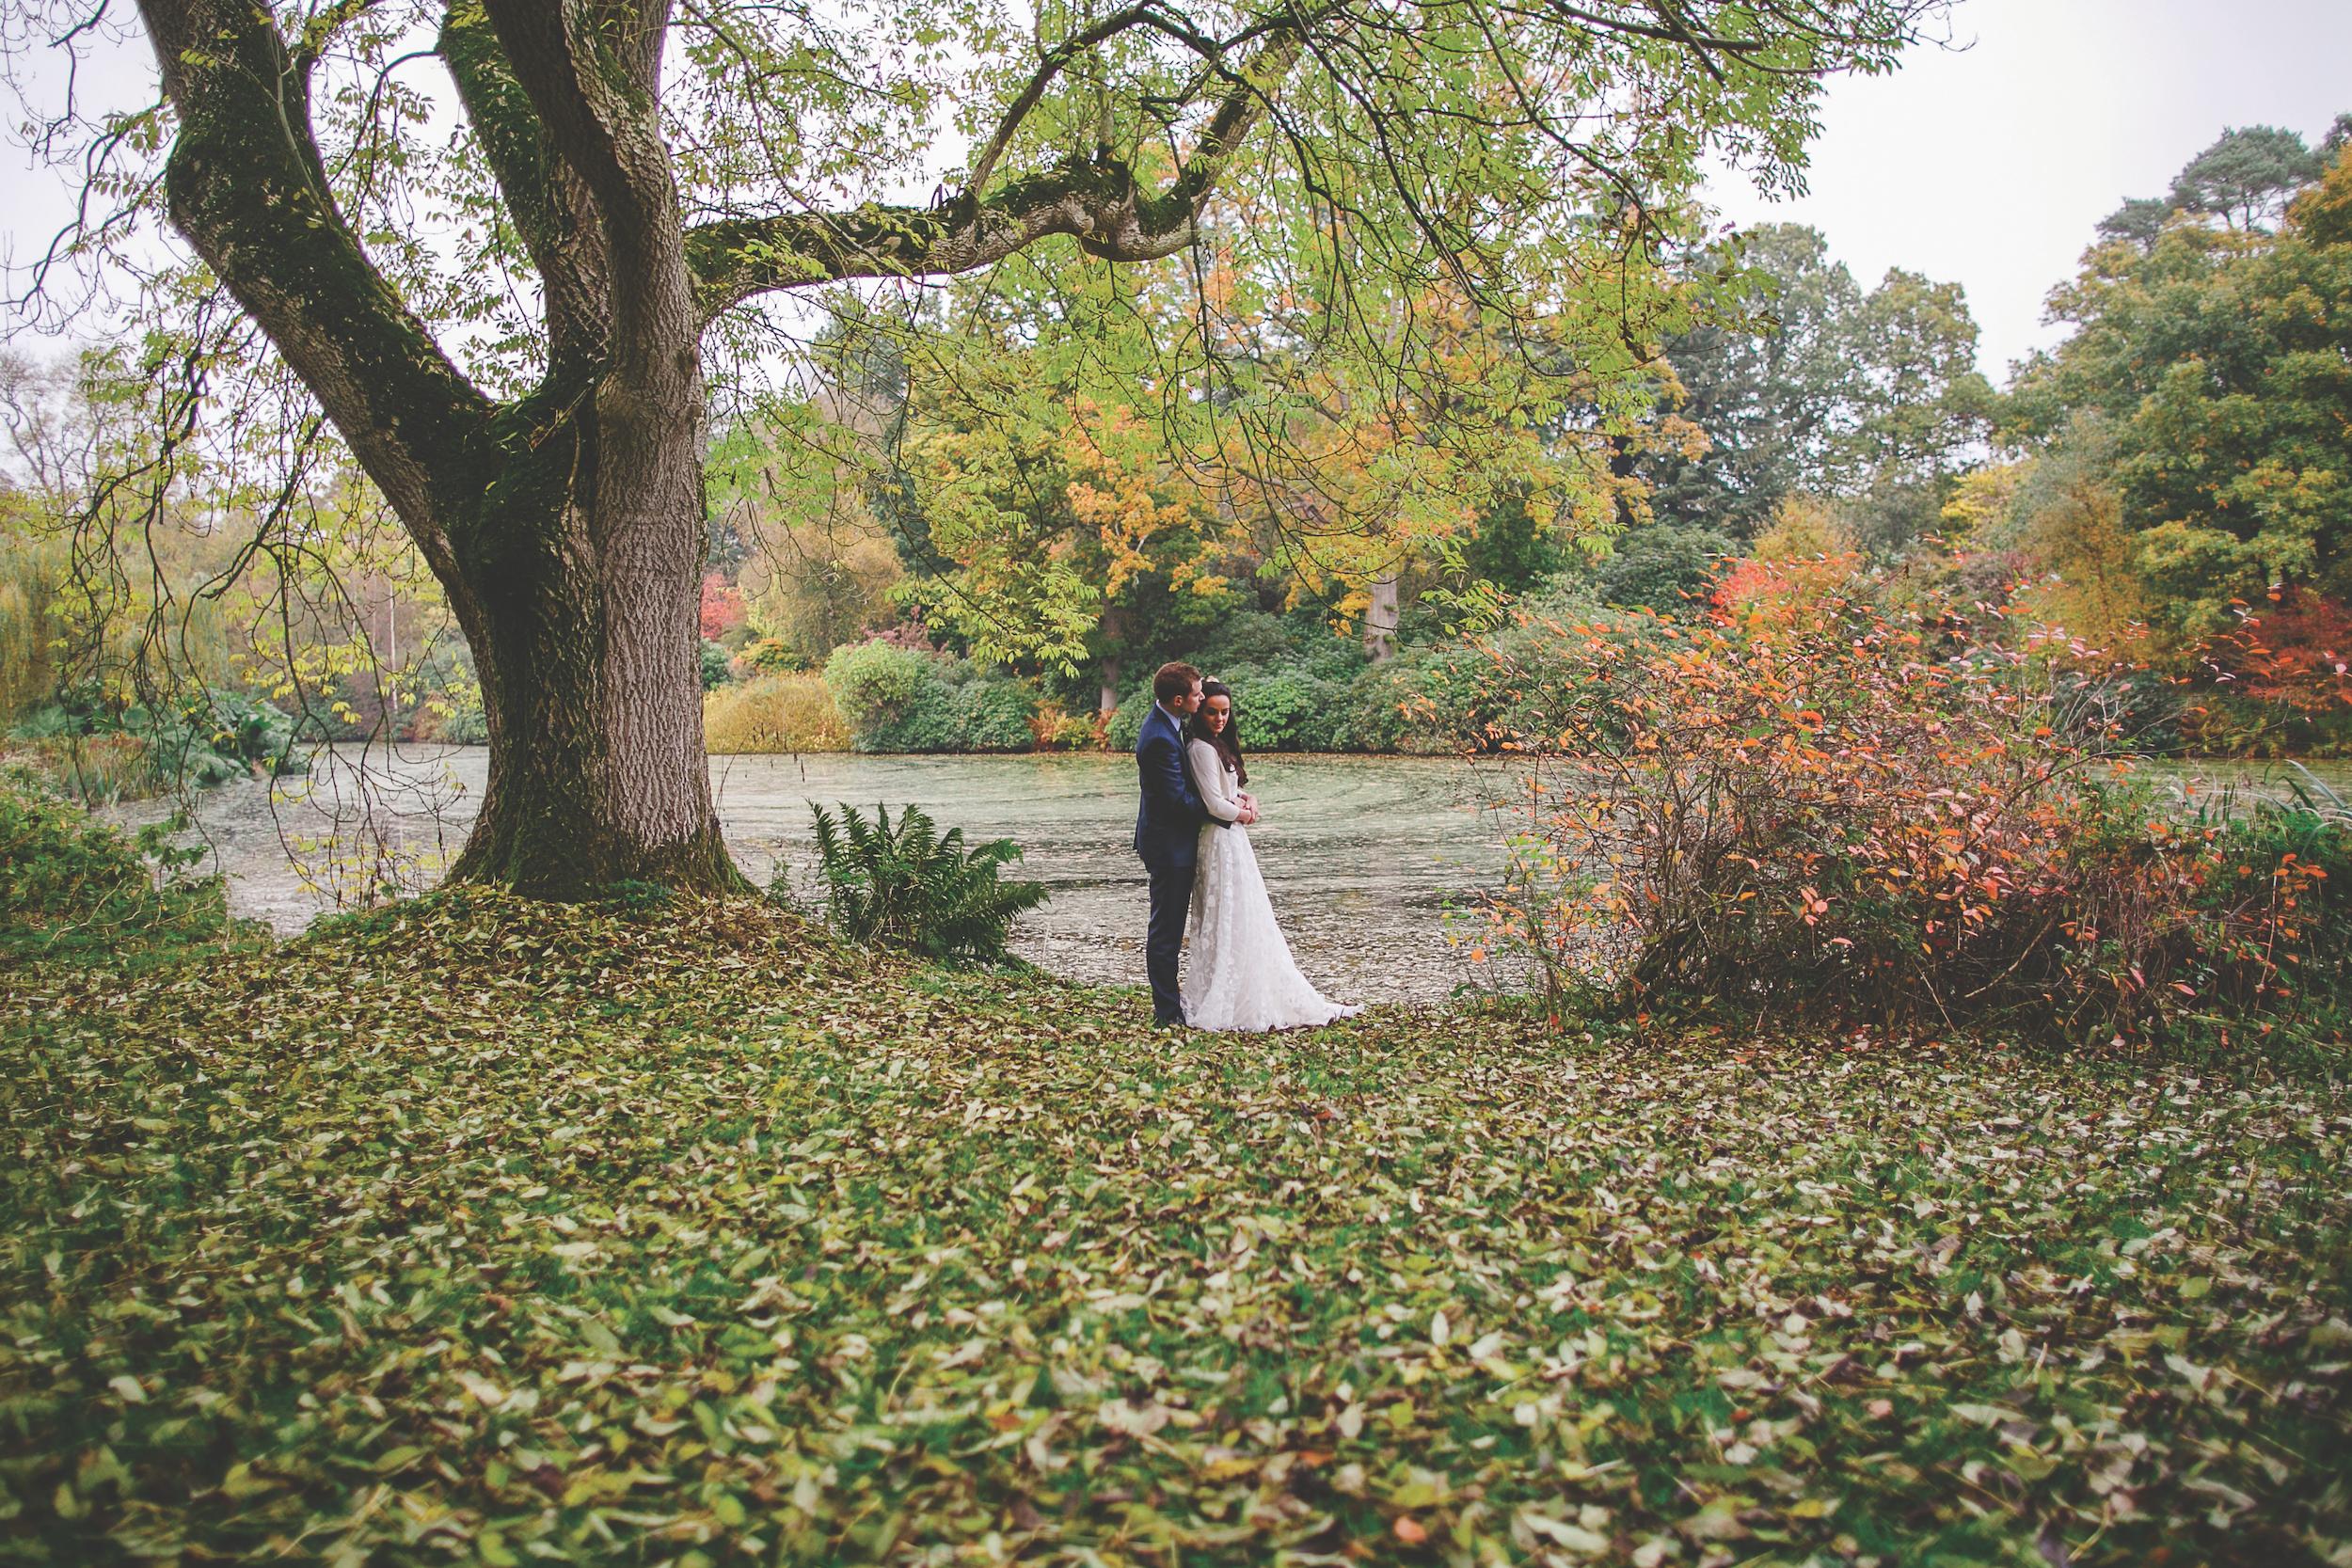 gather_and_tides_wedding_photographer_larchfield_autumn_northern_ireland_Wedding_inspire_Weddings_10.jpeg